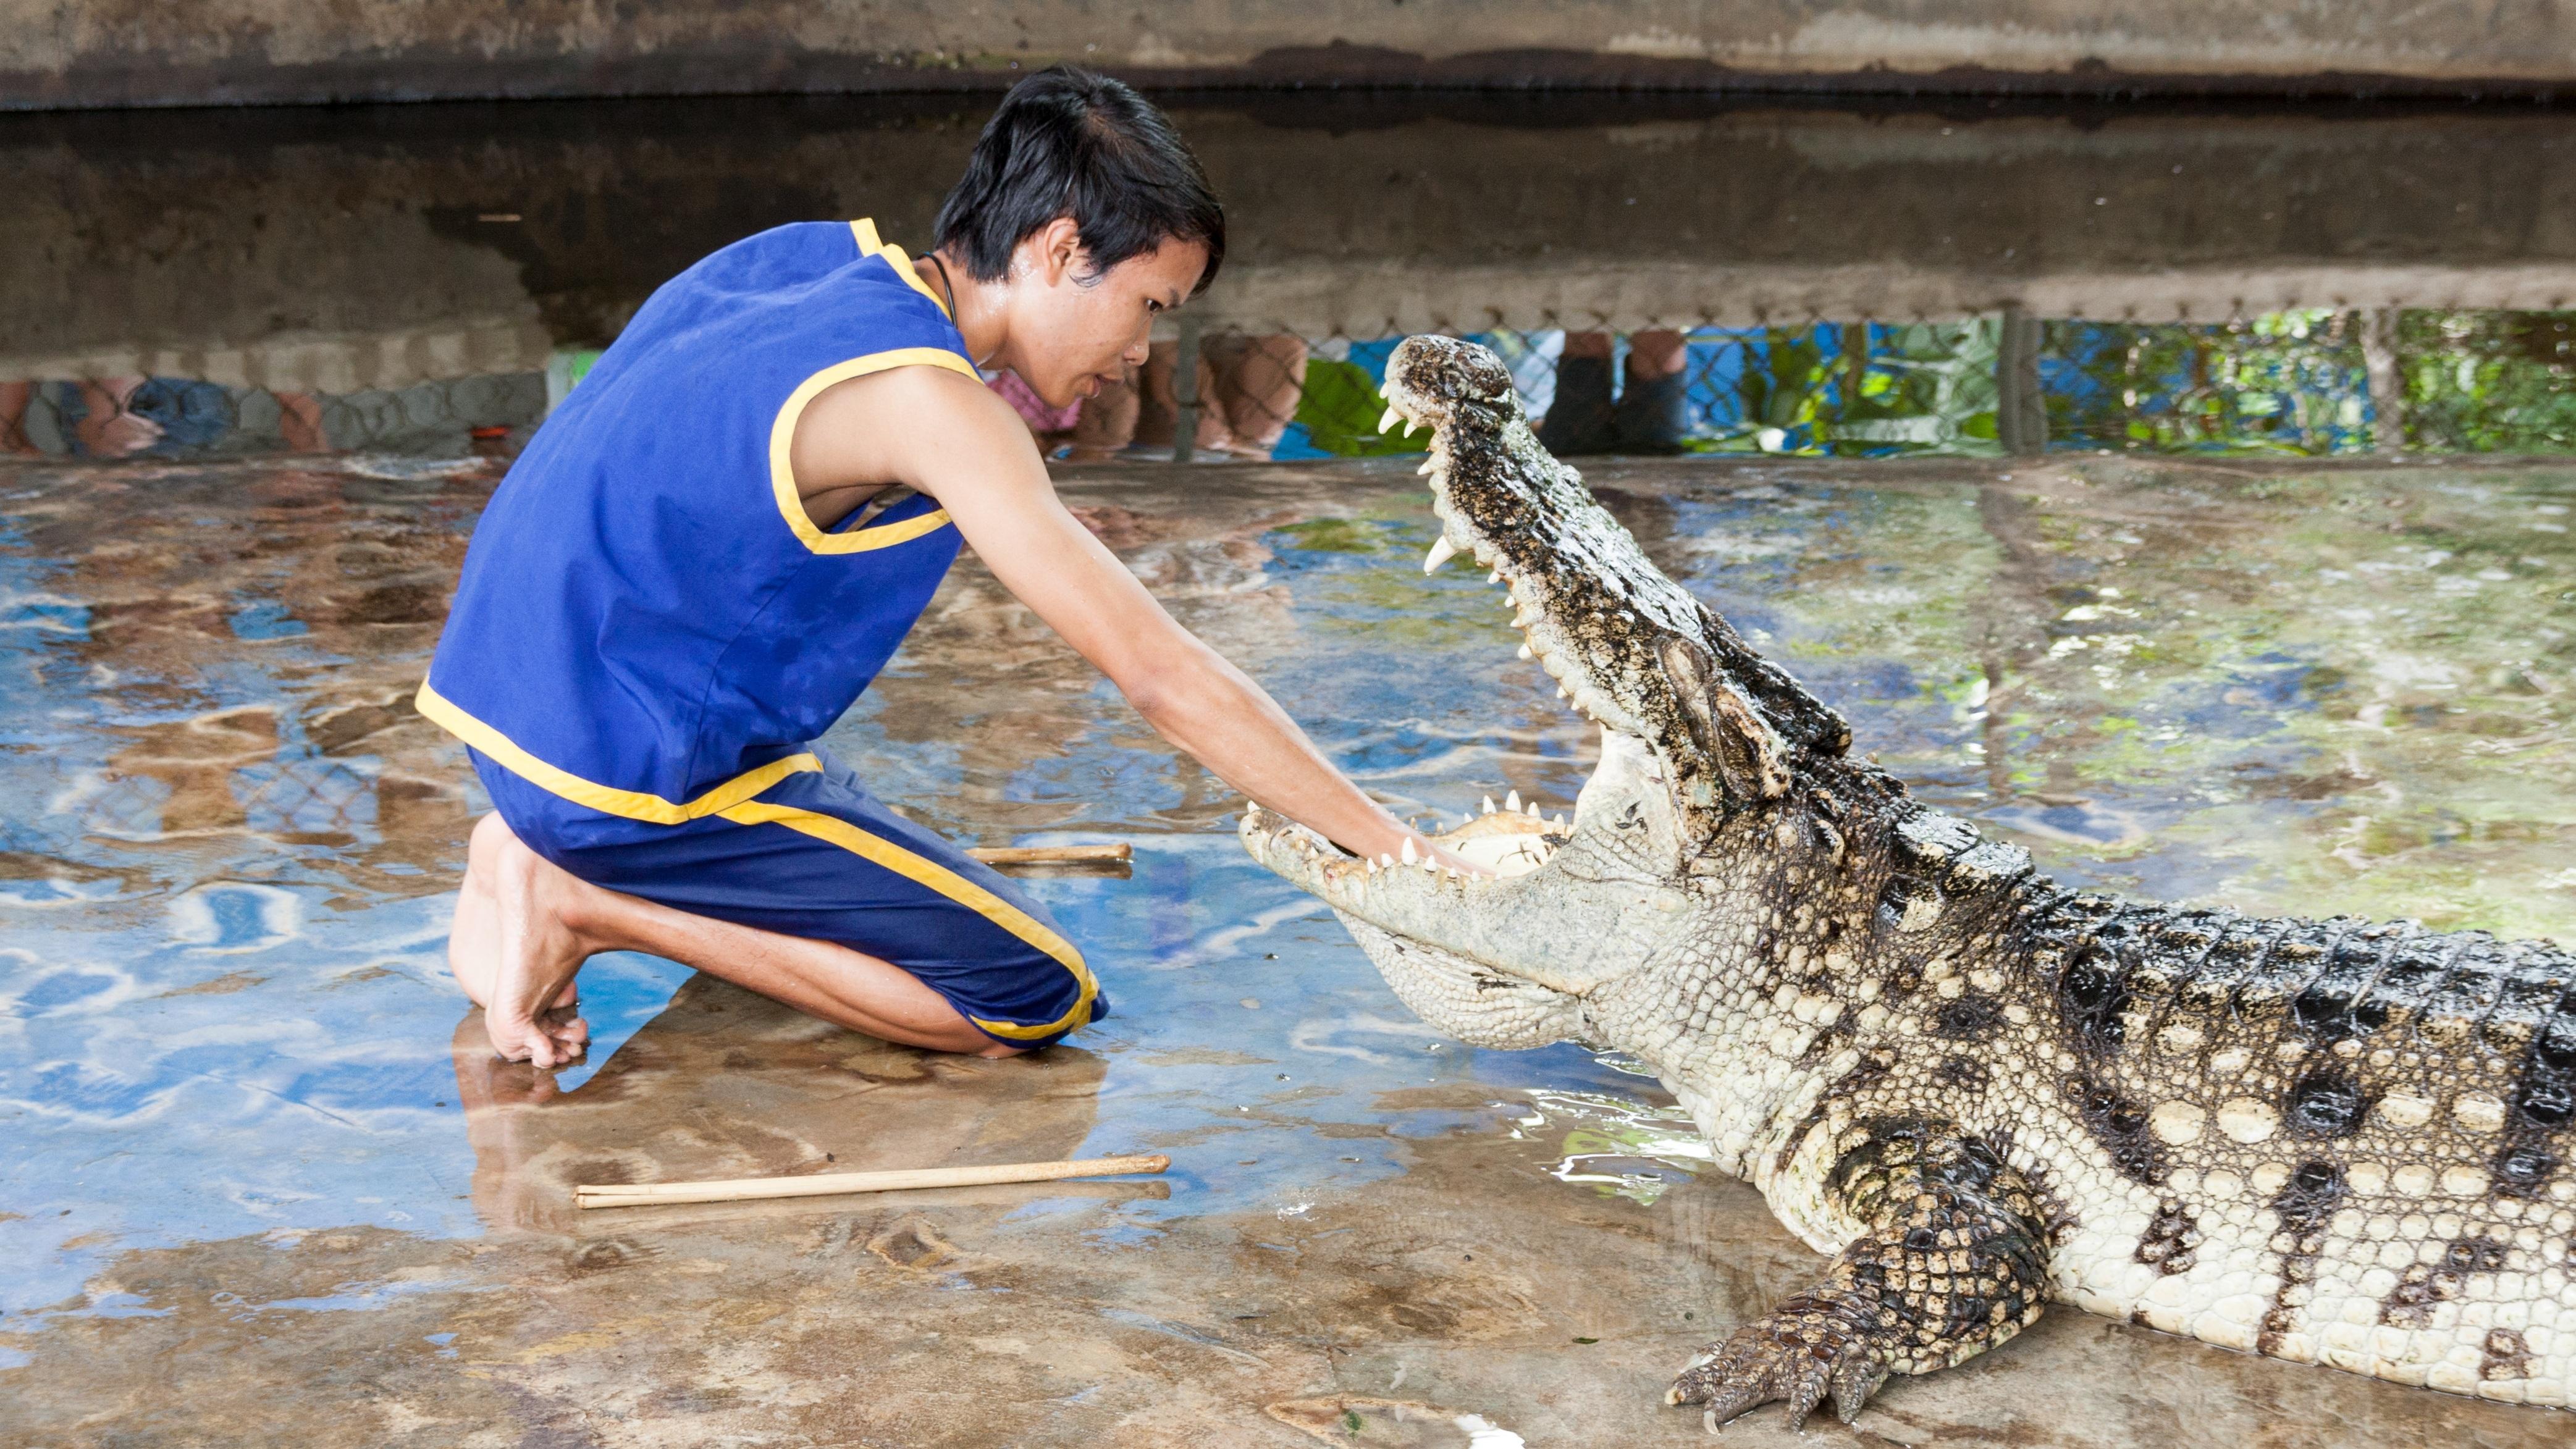 Free Images  Man, Show, Biology, Predator, Reptile, Fauna -5488